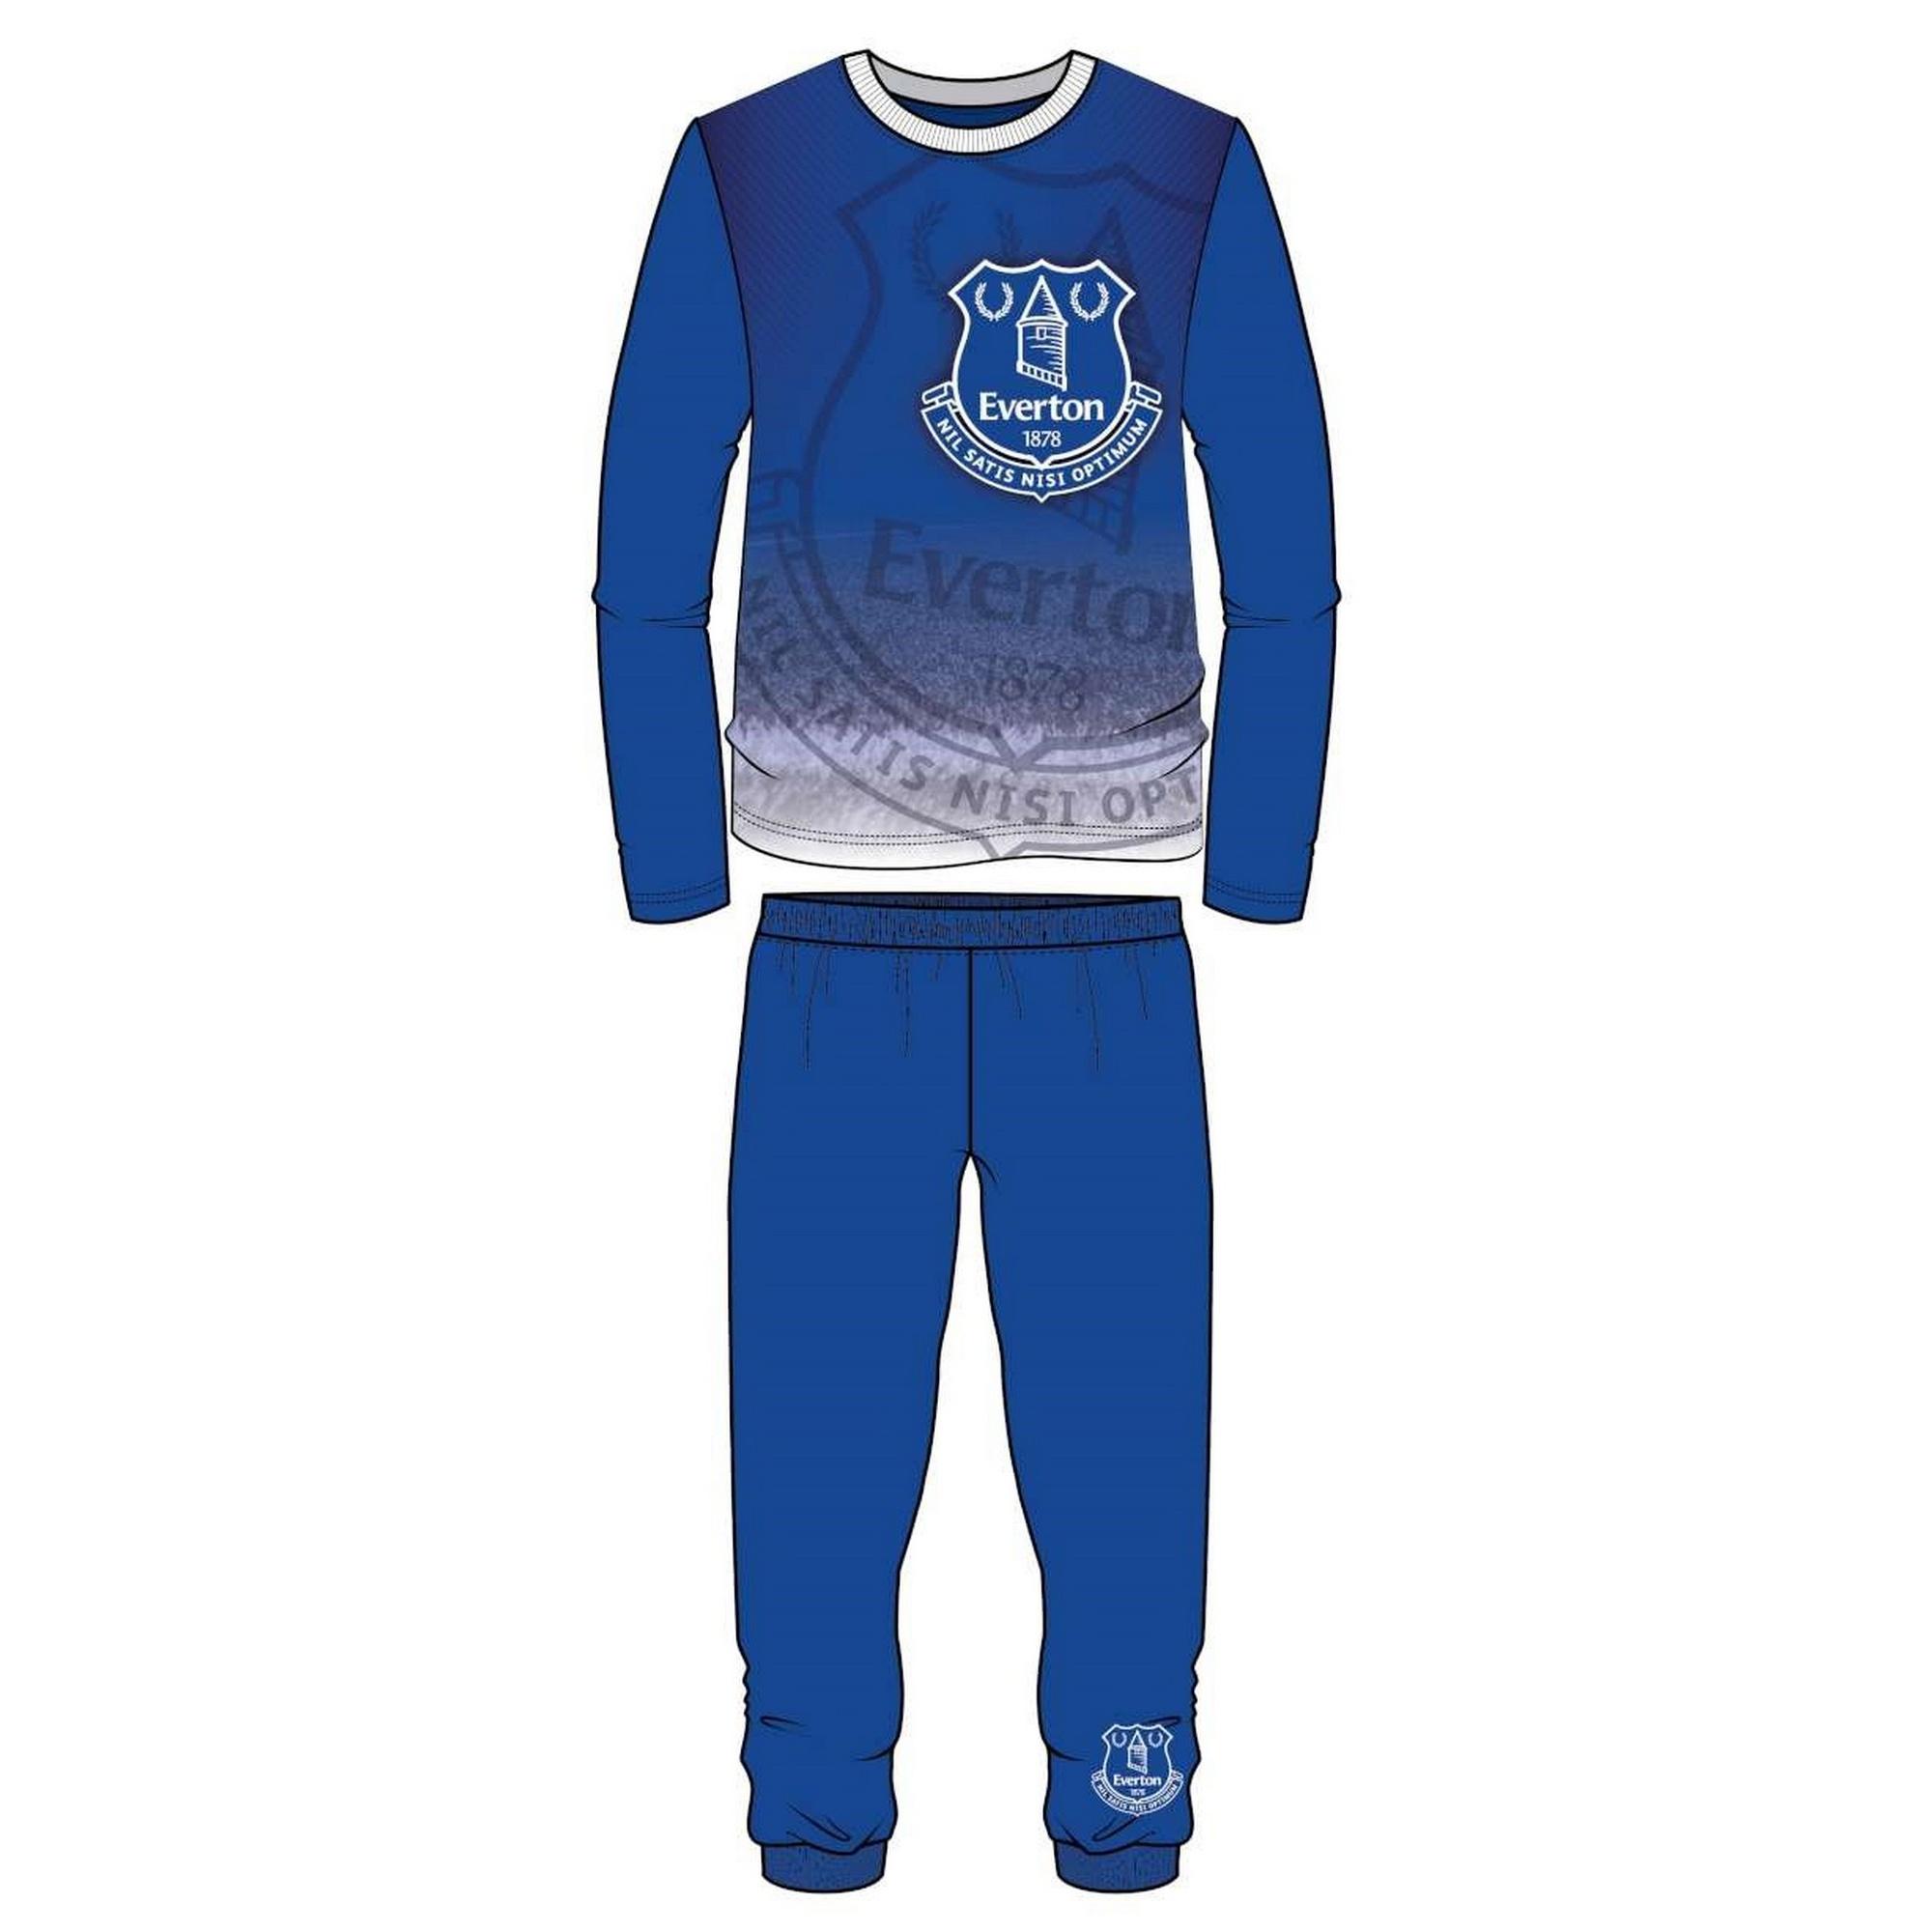 Everton-FC-Pijama-de-manga-larga-oficial-de-Everton-FC-para-nino-TF597